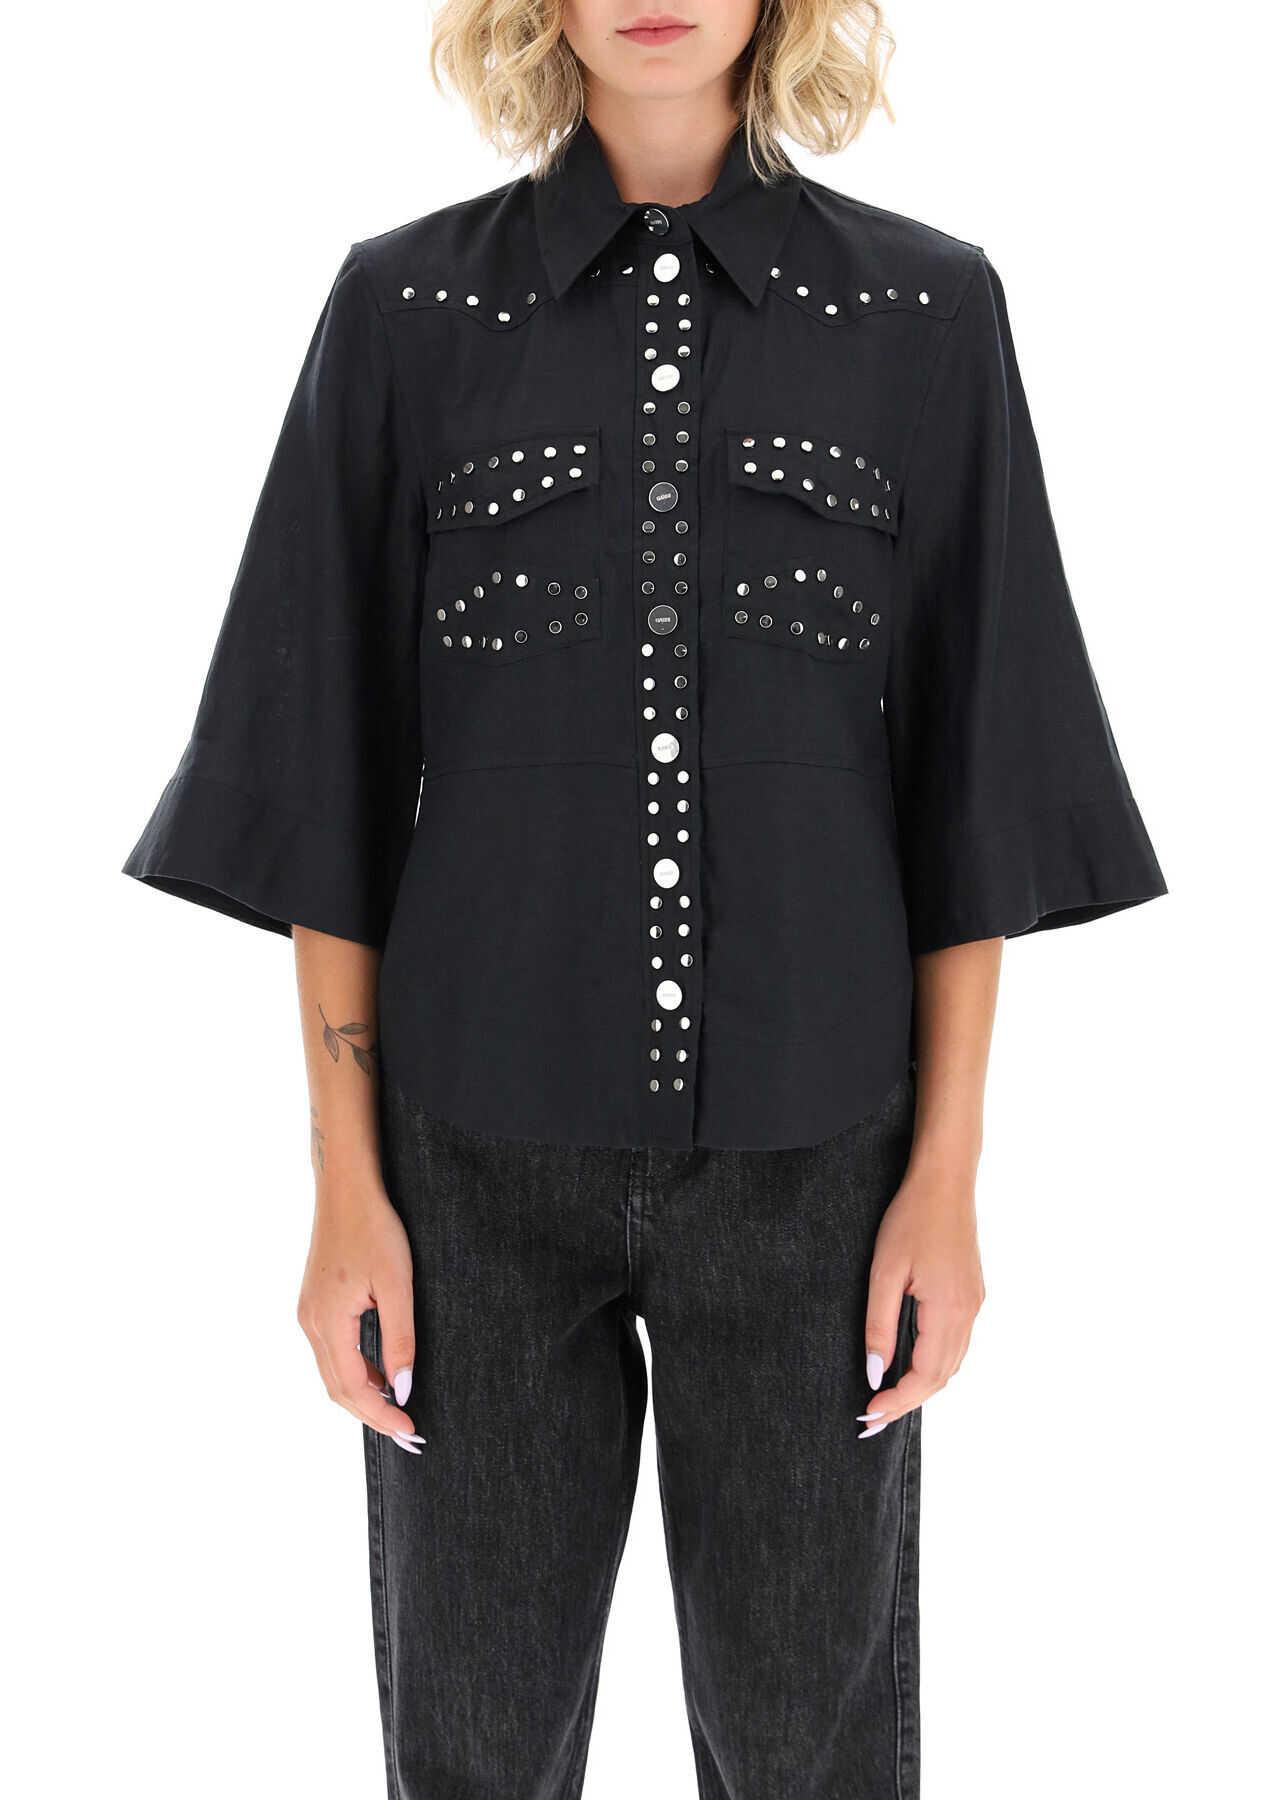 Ganni Studded Shirt F4734 PHANTOM image0